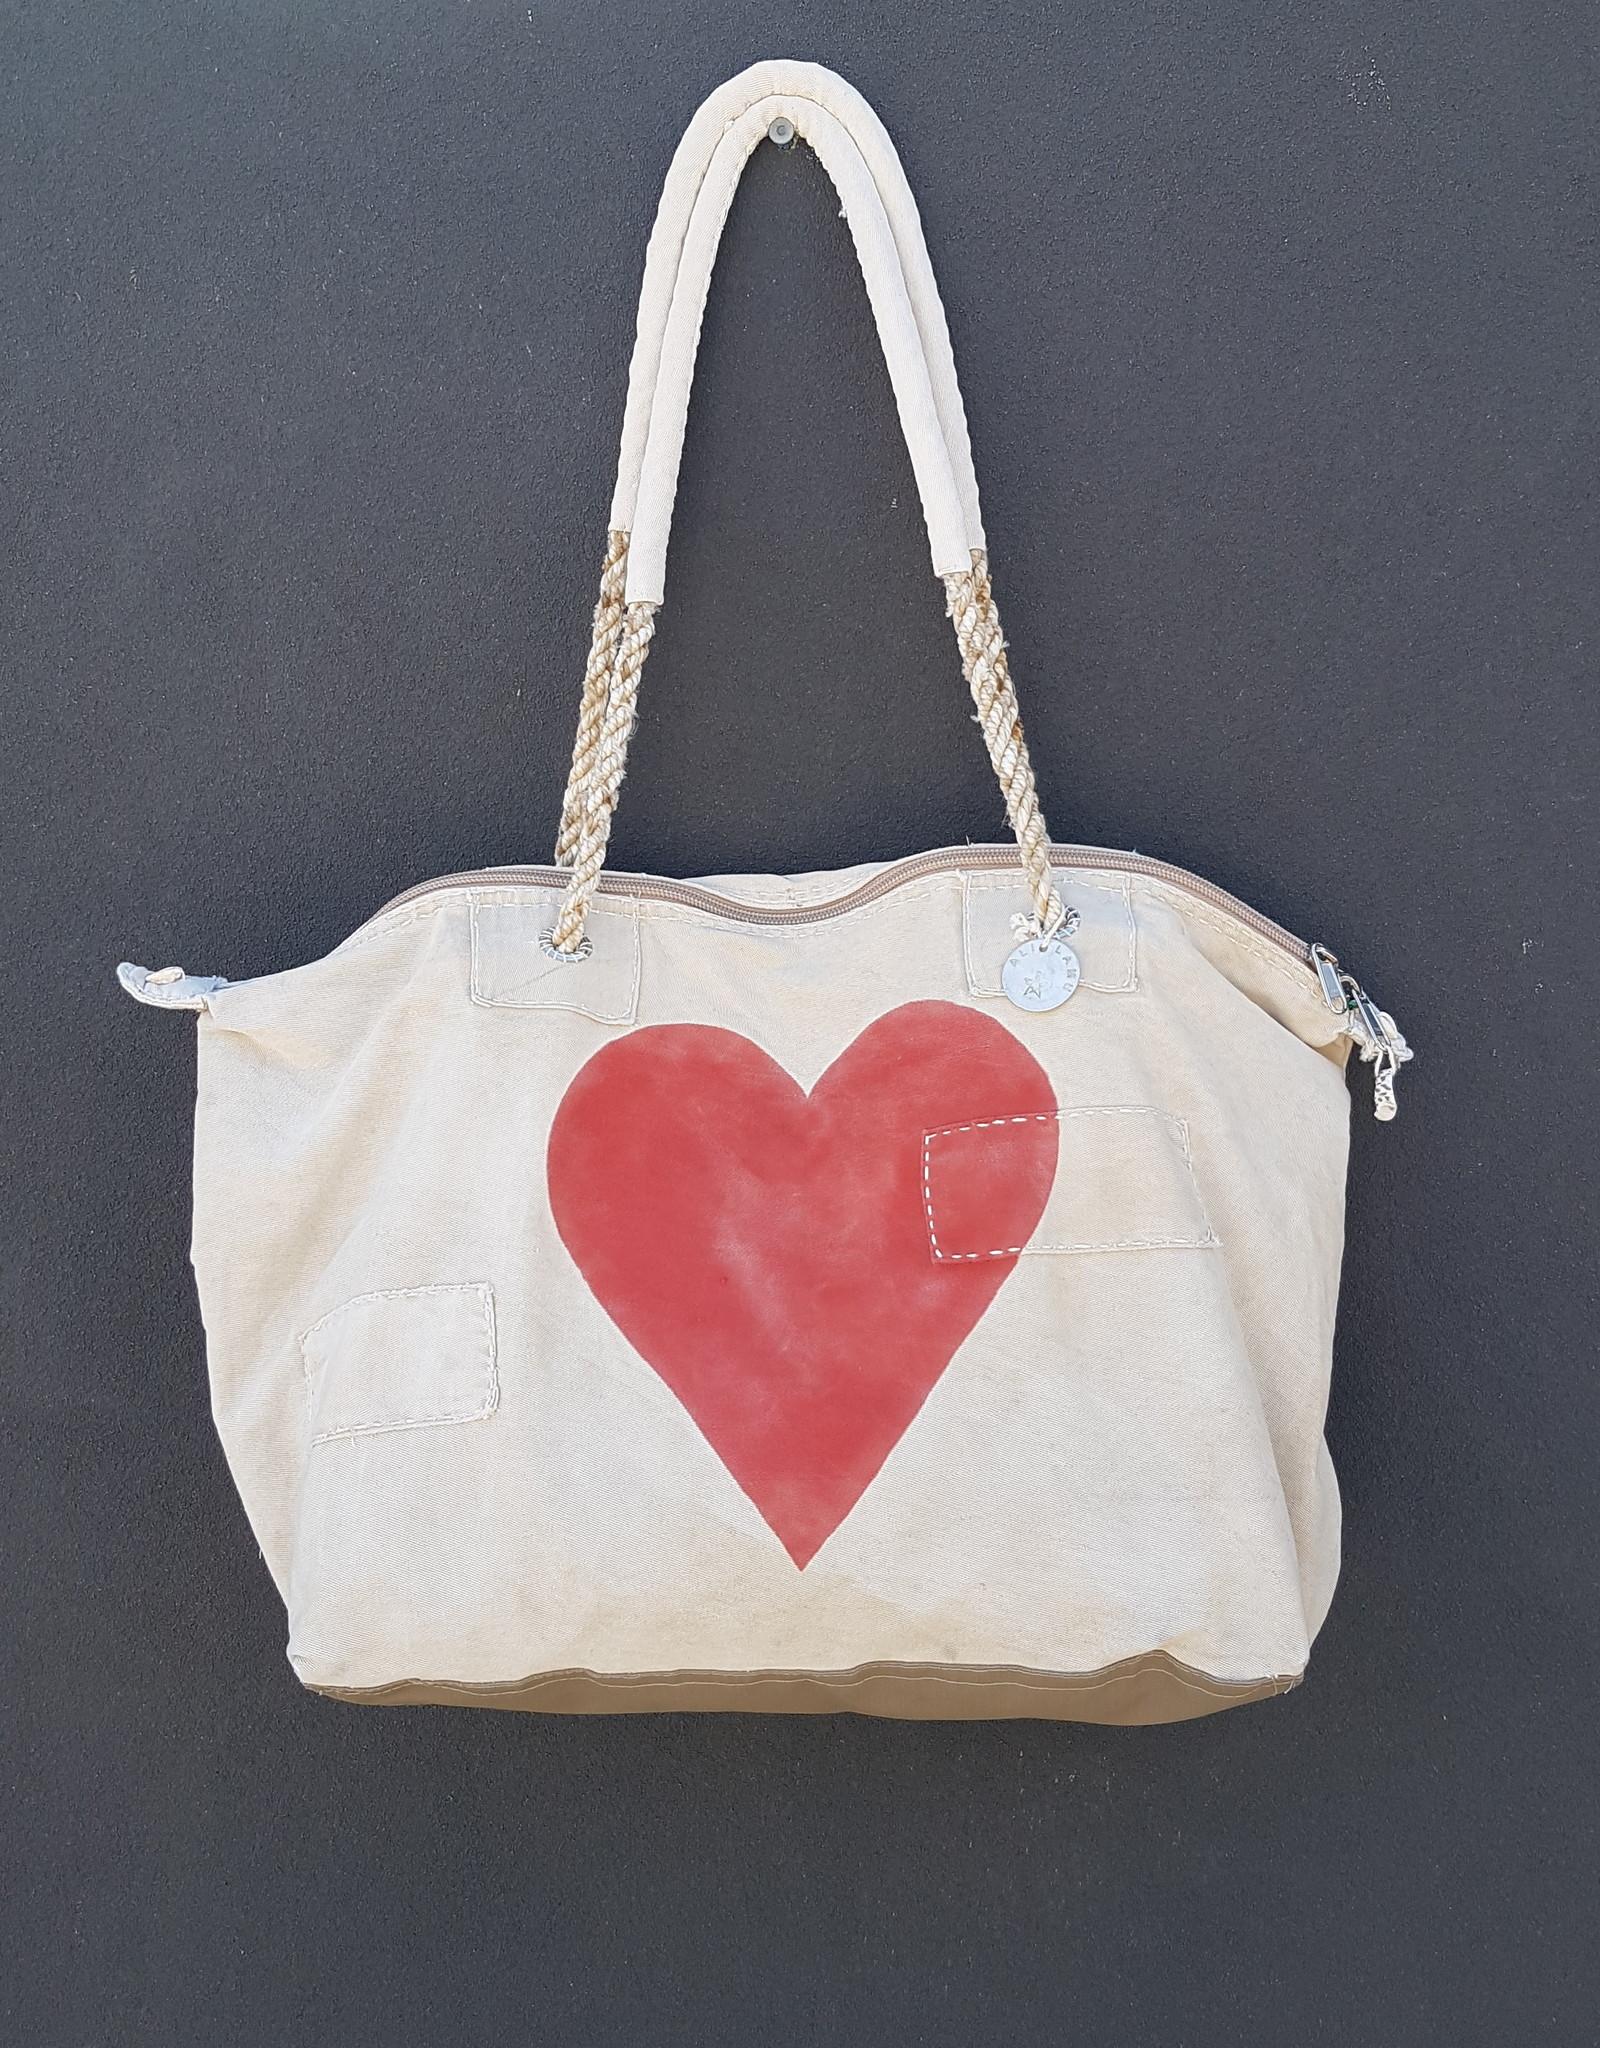 ALI LAMU LARGE WEEKEND BAG CREAM RED HEART